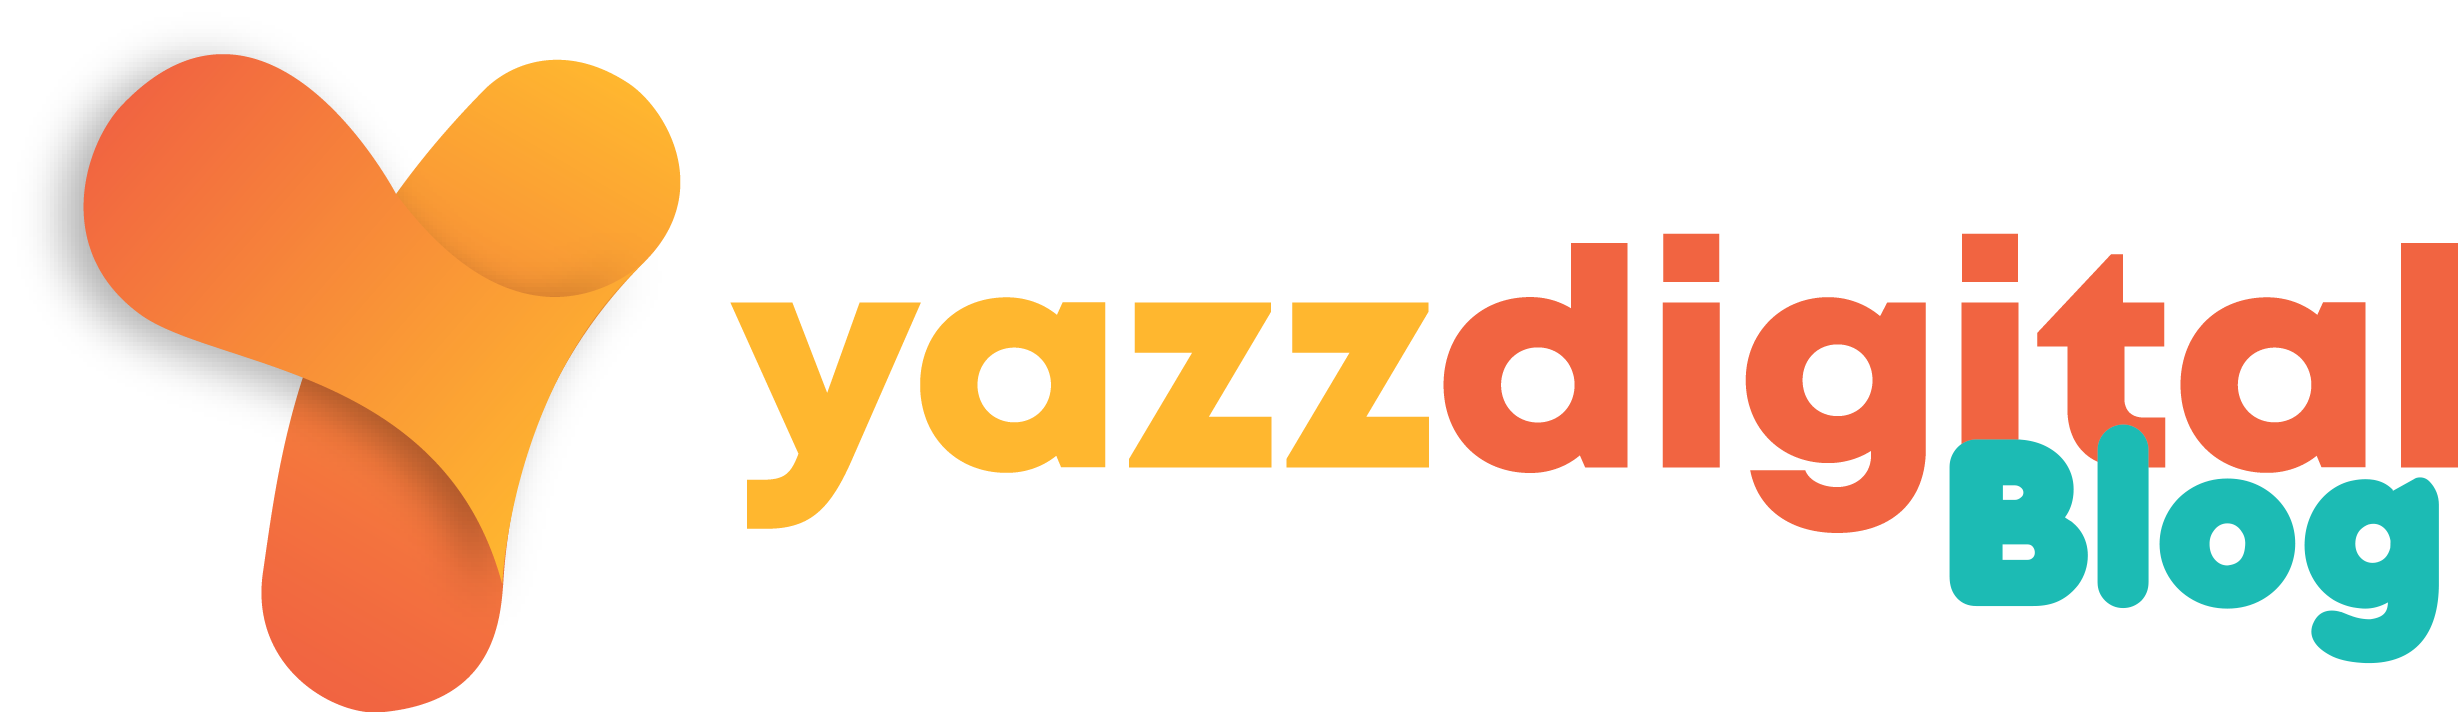 Yazzdigital Blog